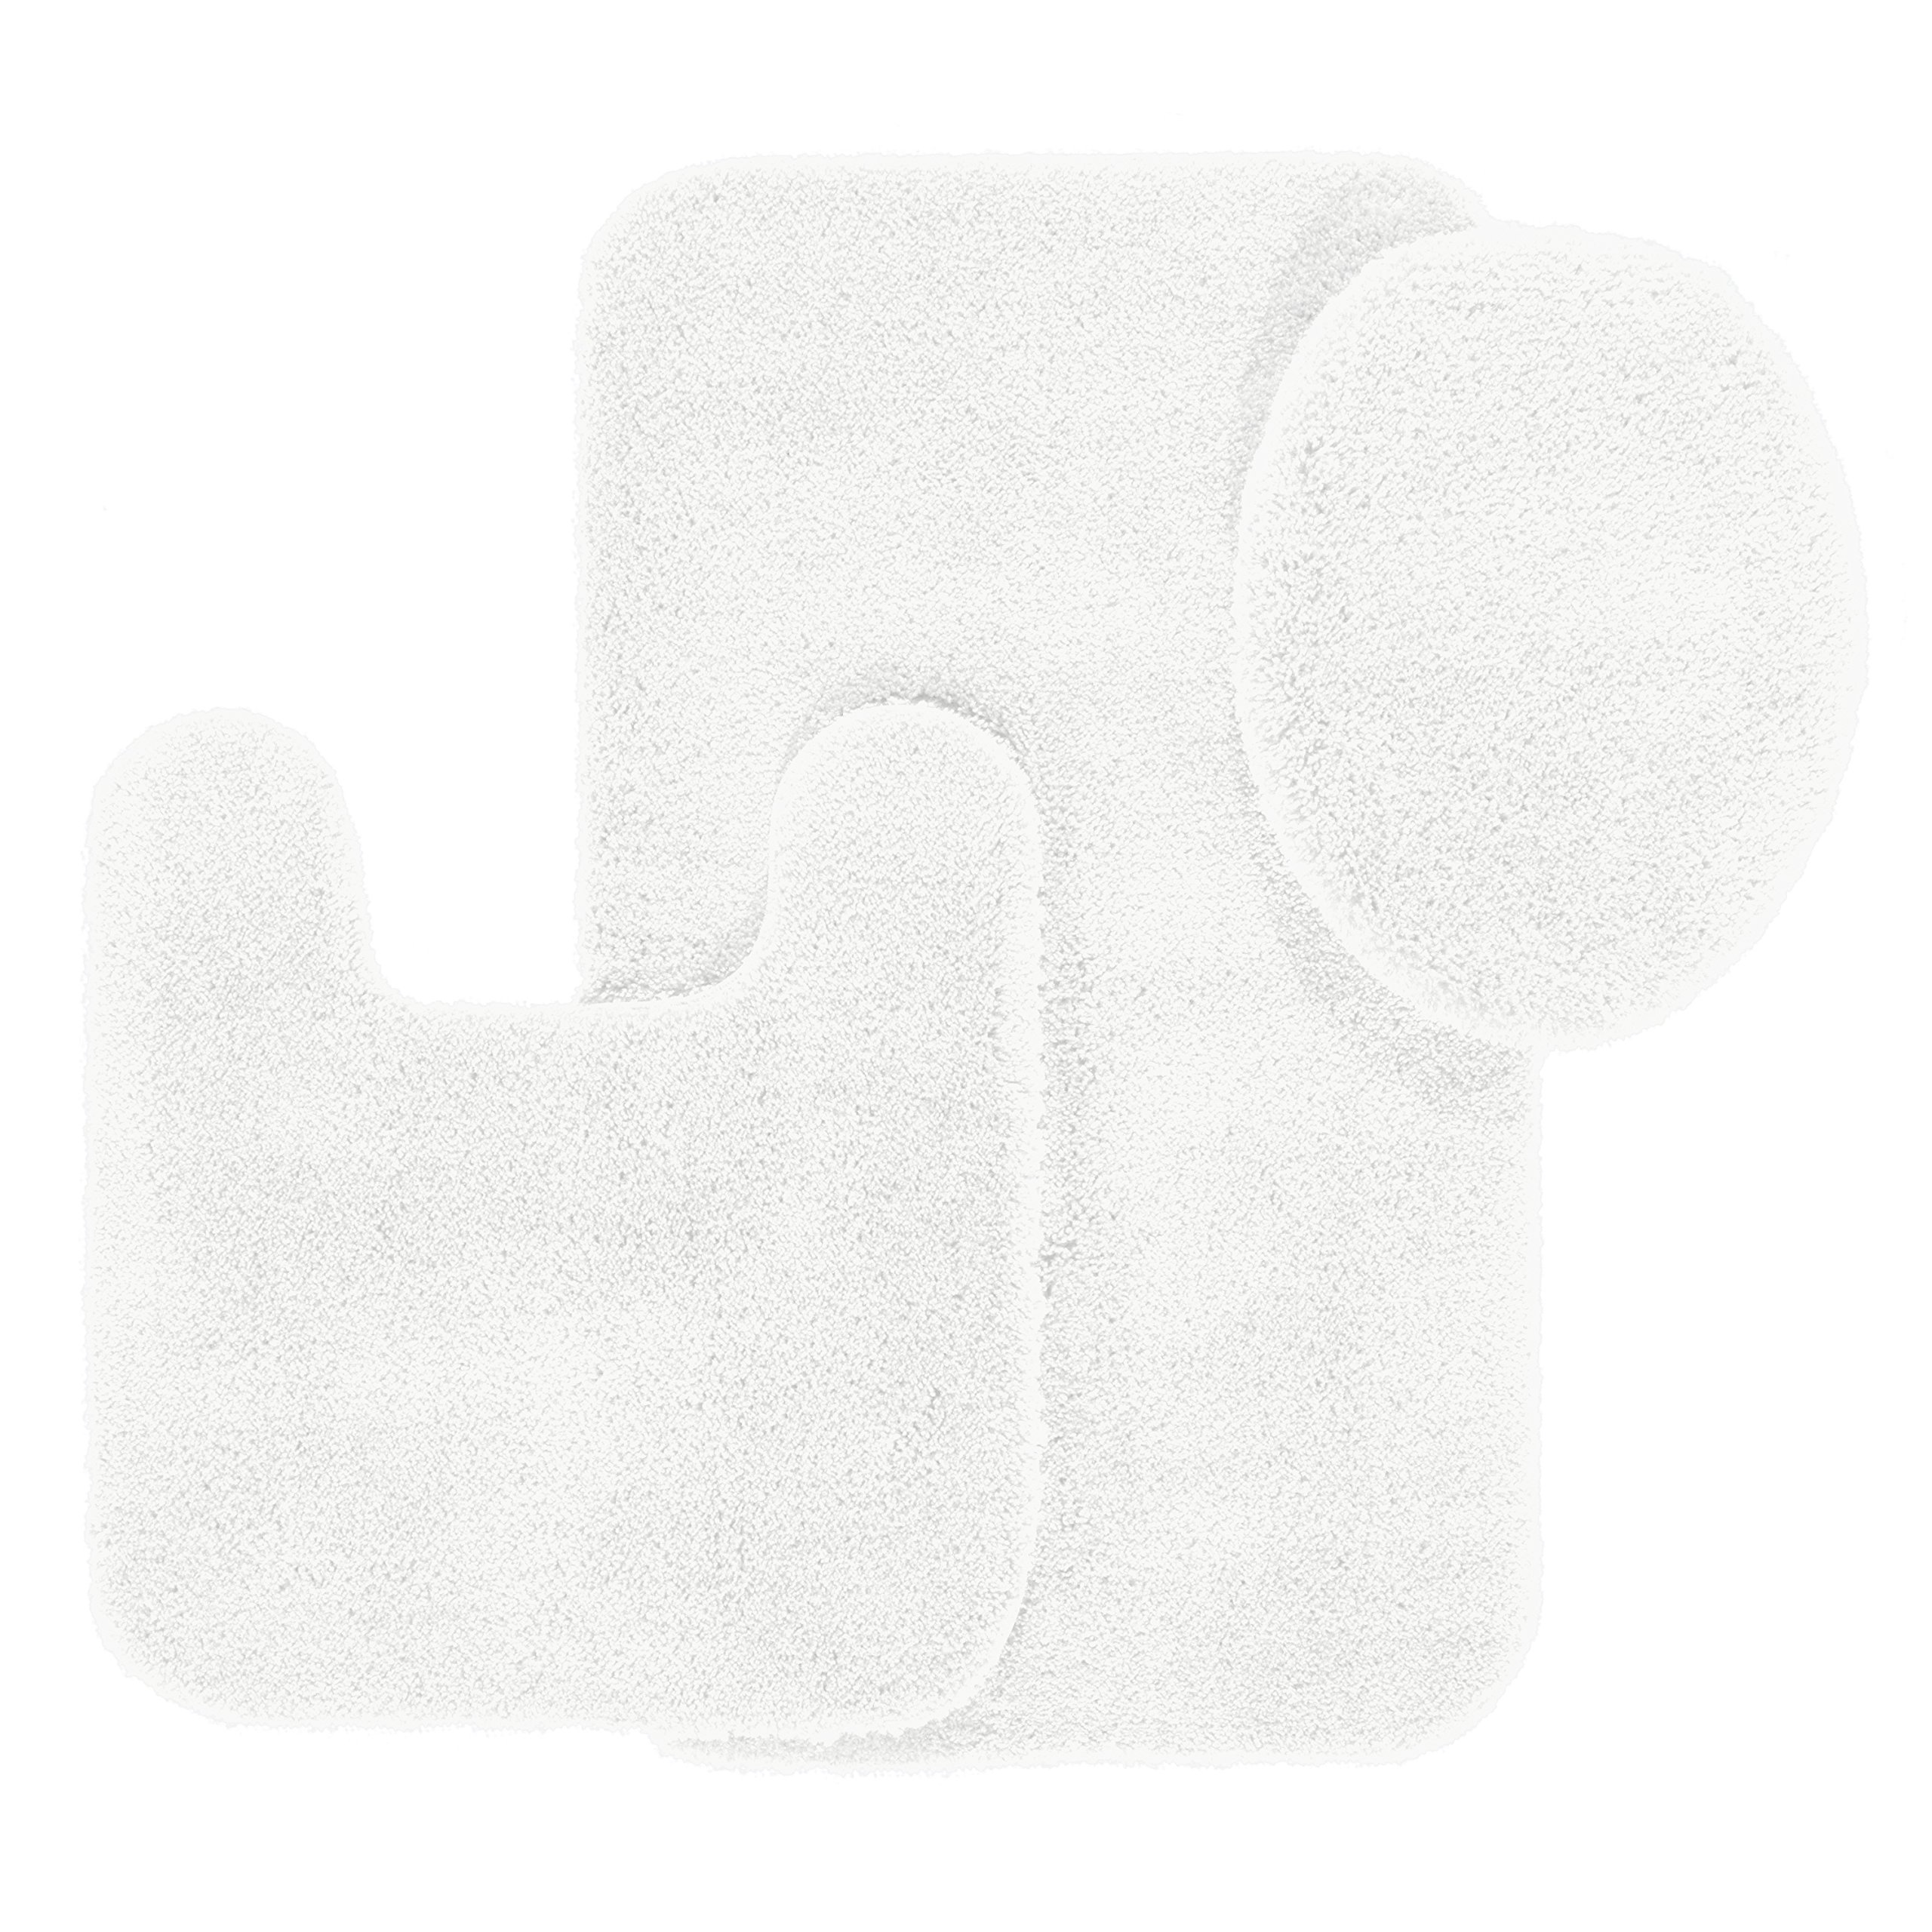 Buy Maples Rugs Bathroom Rugs Set Cloud Bath 3pc Washable Non Slip